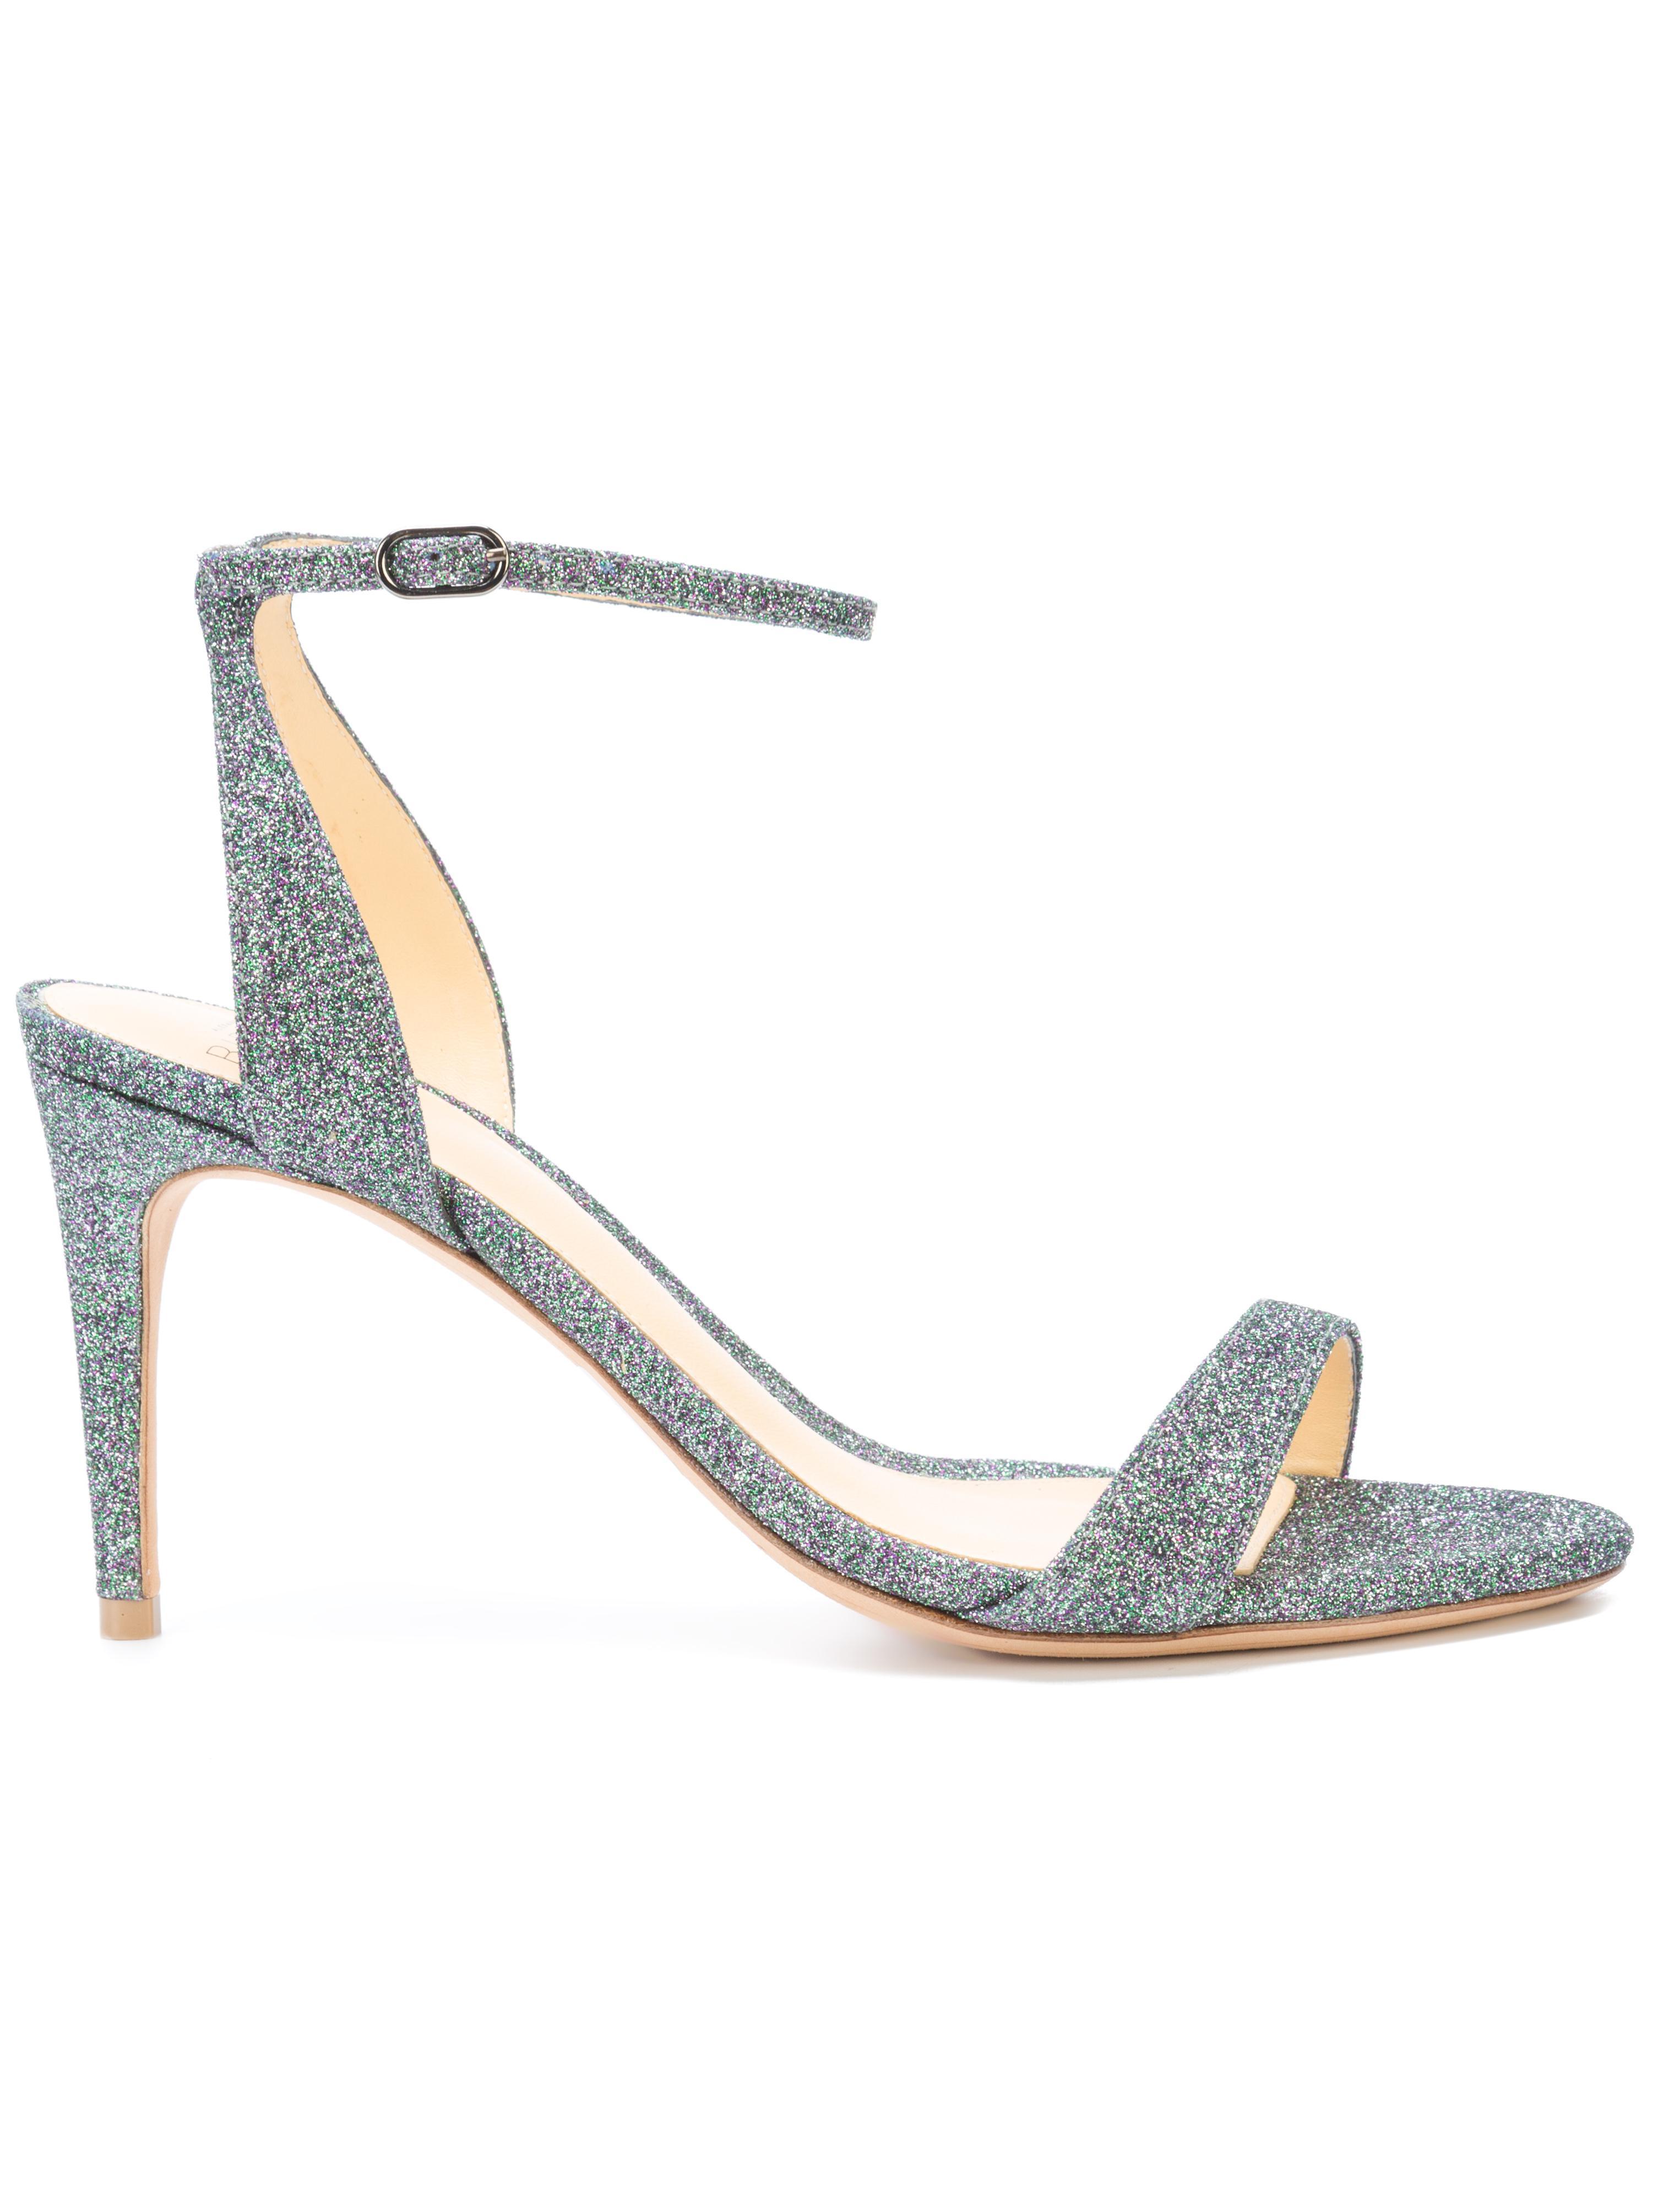 Metallic Strappy Sandal Item # SANTINE